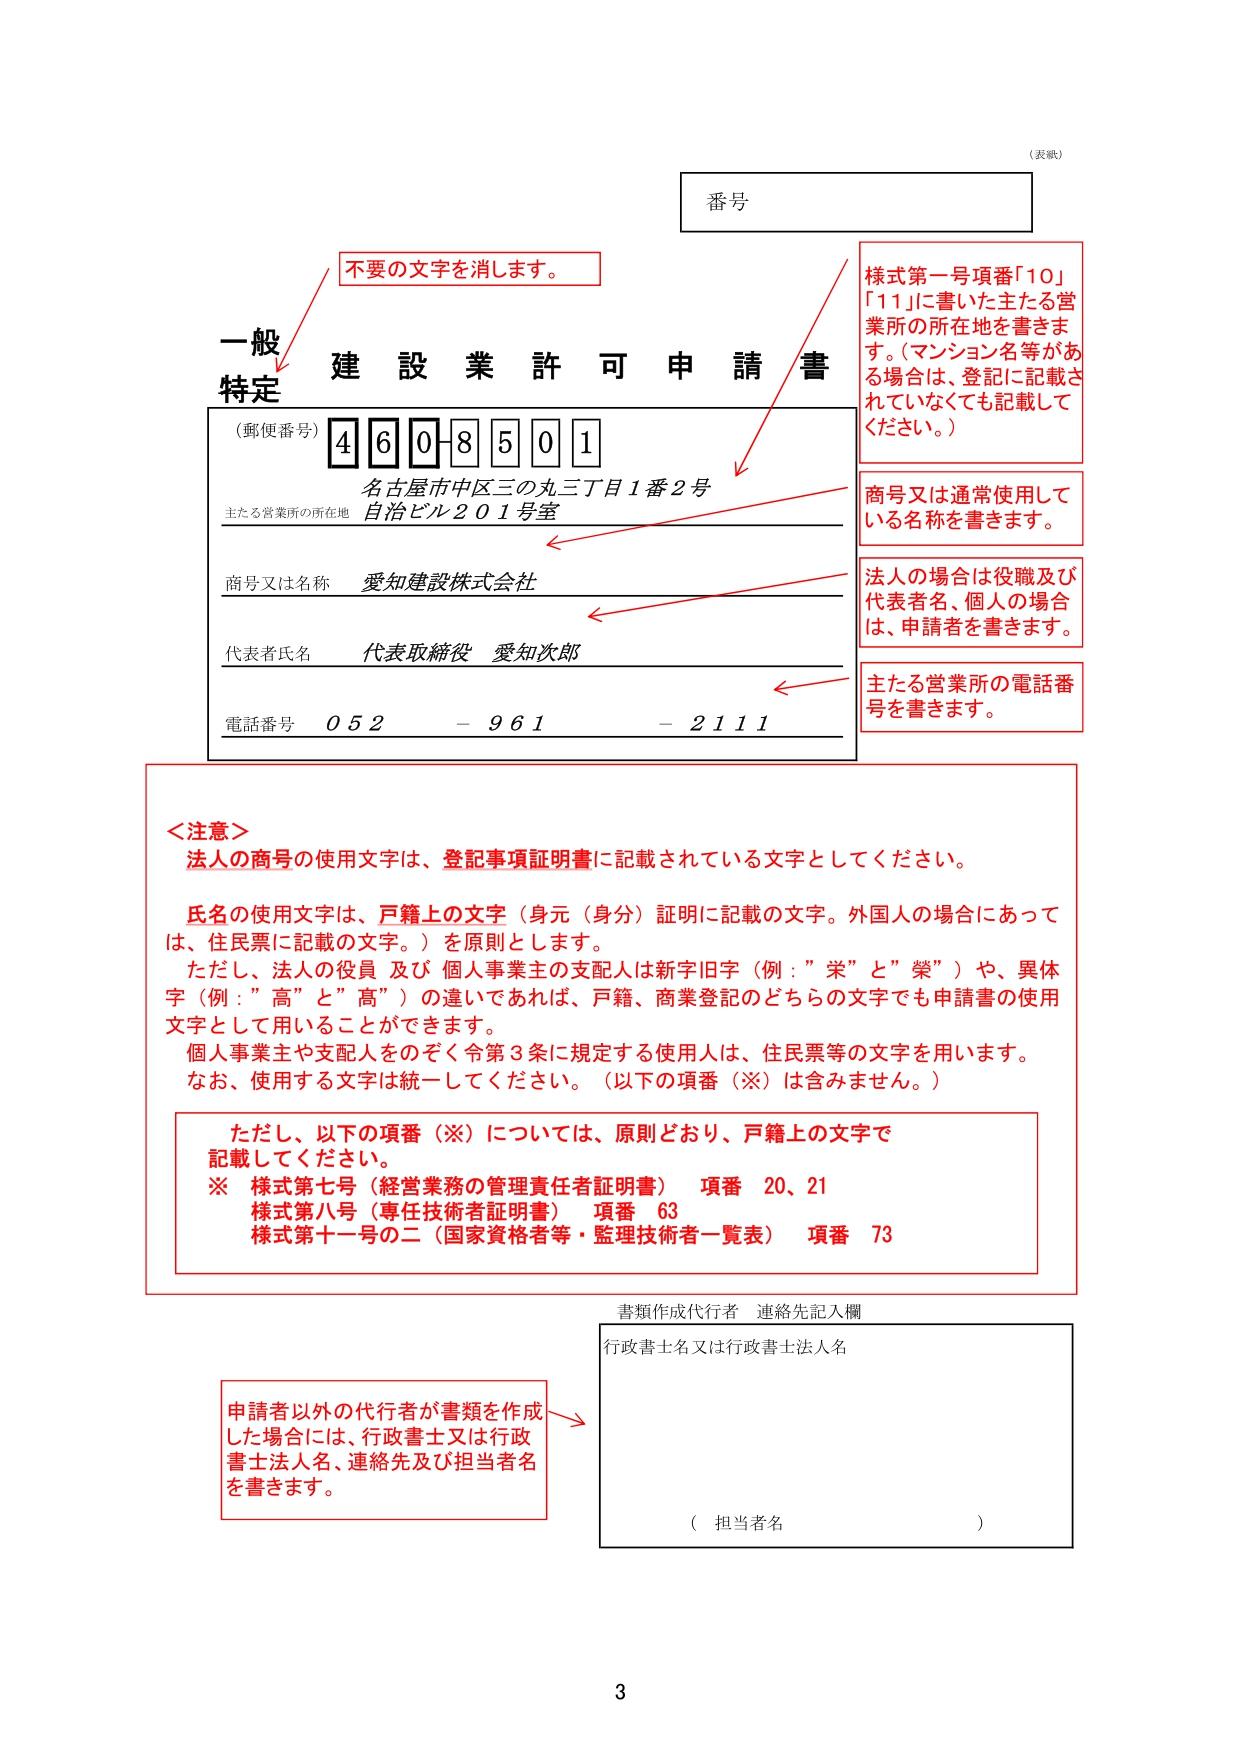 建設業許可申請書_page-0001